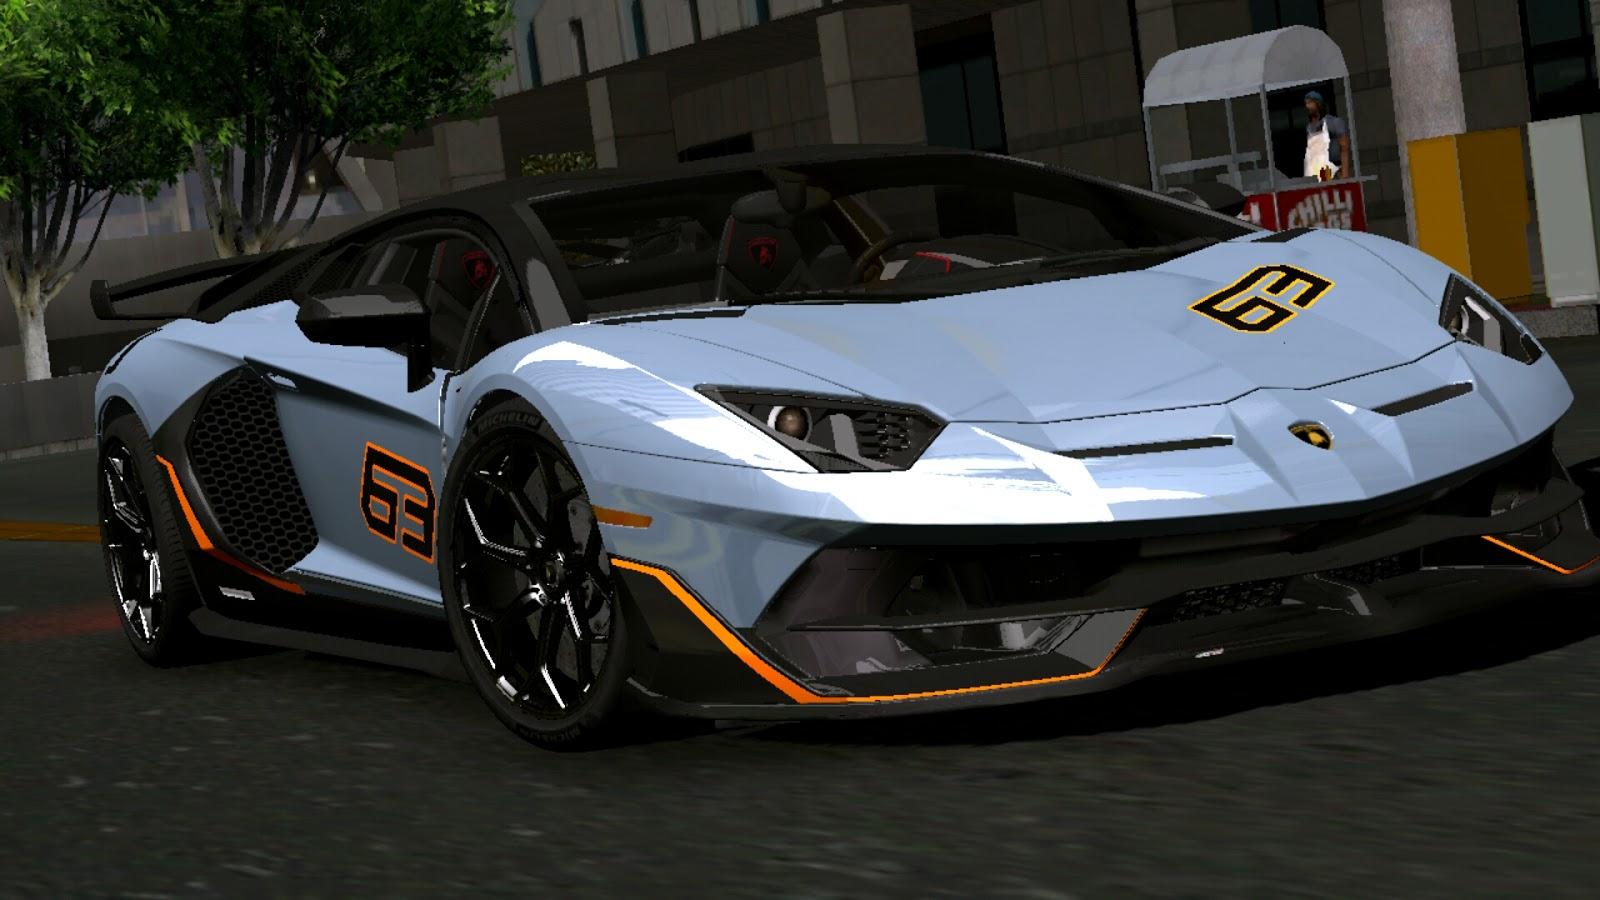 6100 Koleksi Mod Bussid Mobil Lamborghini Aventador HD Terbaik